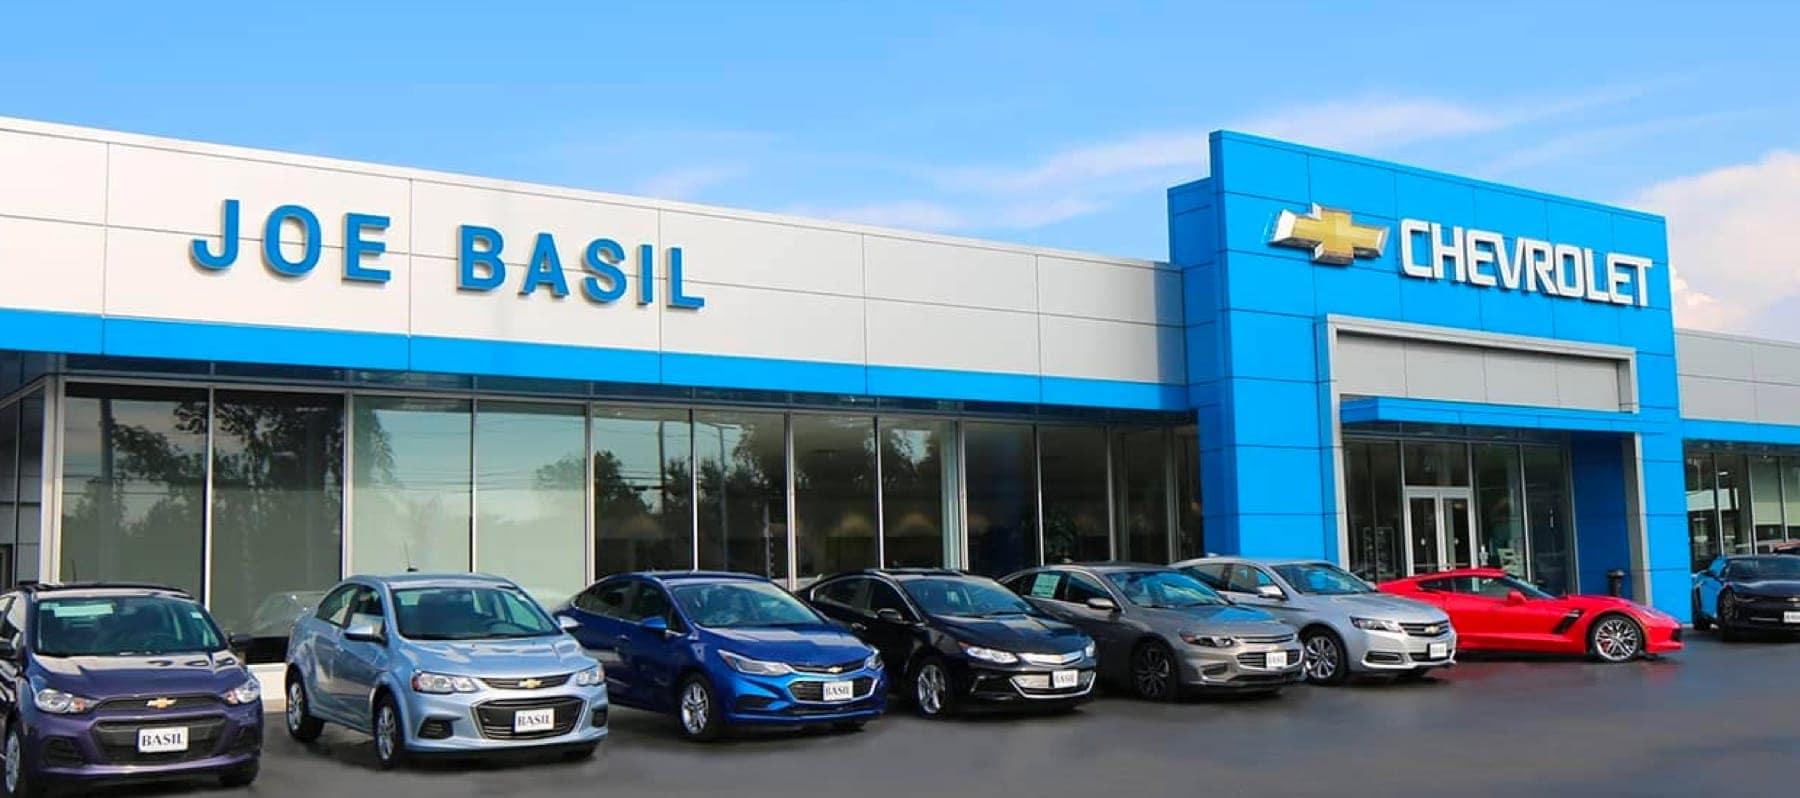 Joe Basil Chevrolet Chevrolet Dealer In Depew Ny